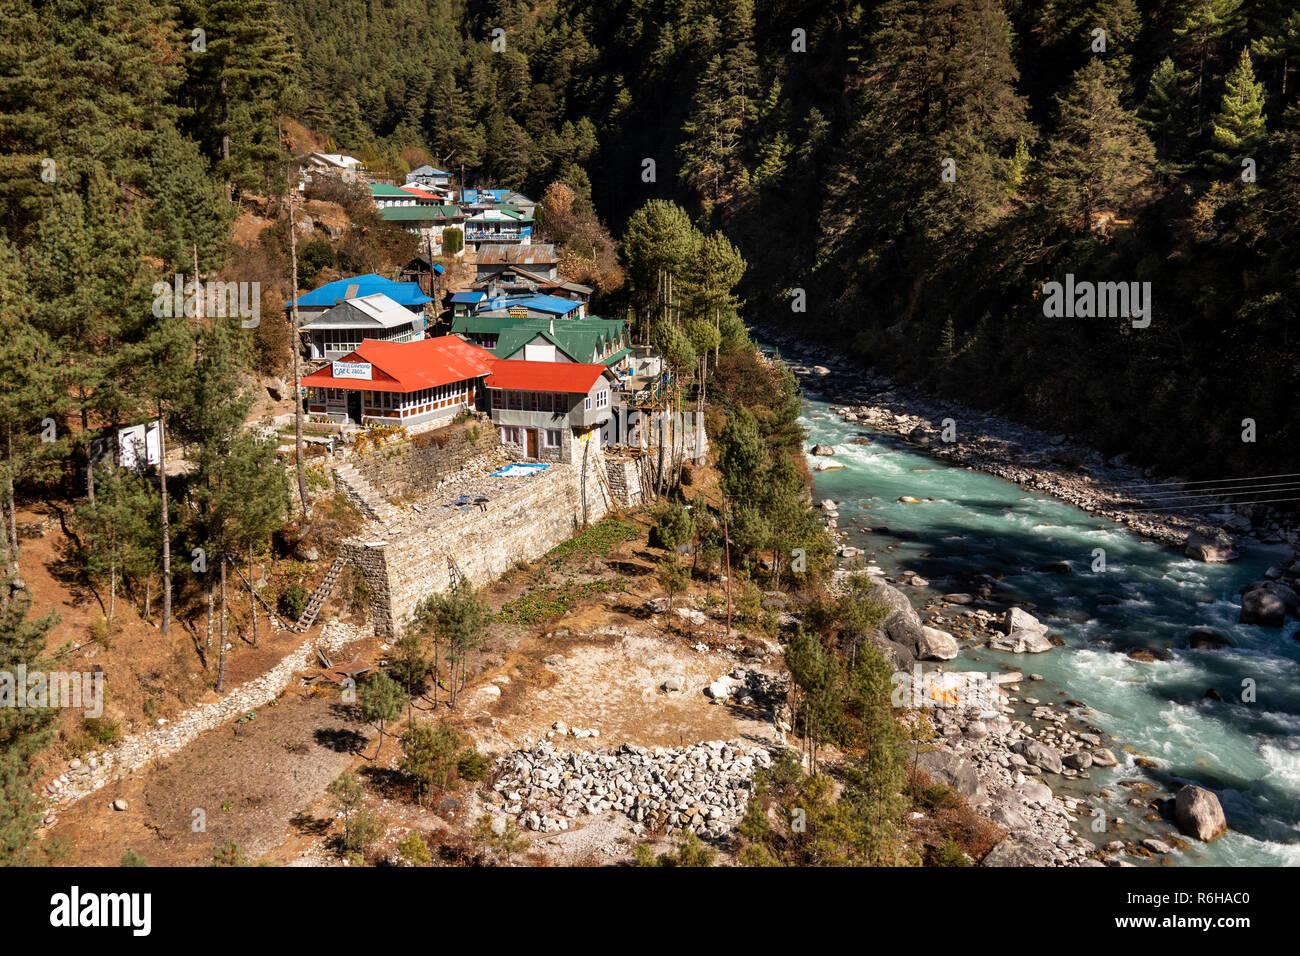 Nepal, Jorsale (Thumbug), Dudh Khosi river flowing past village - Stock Image